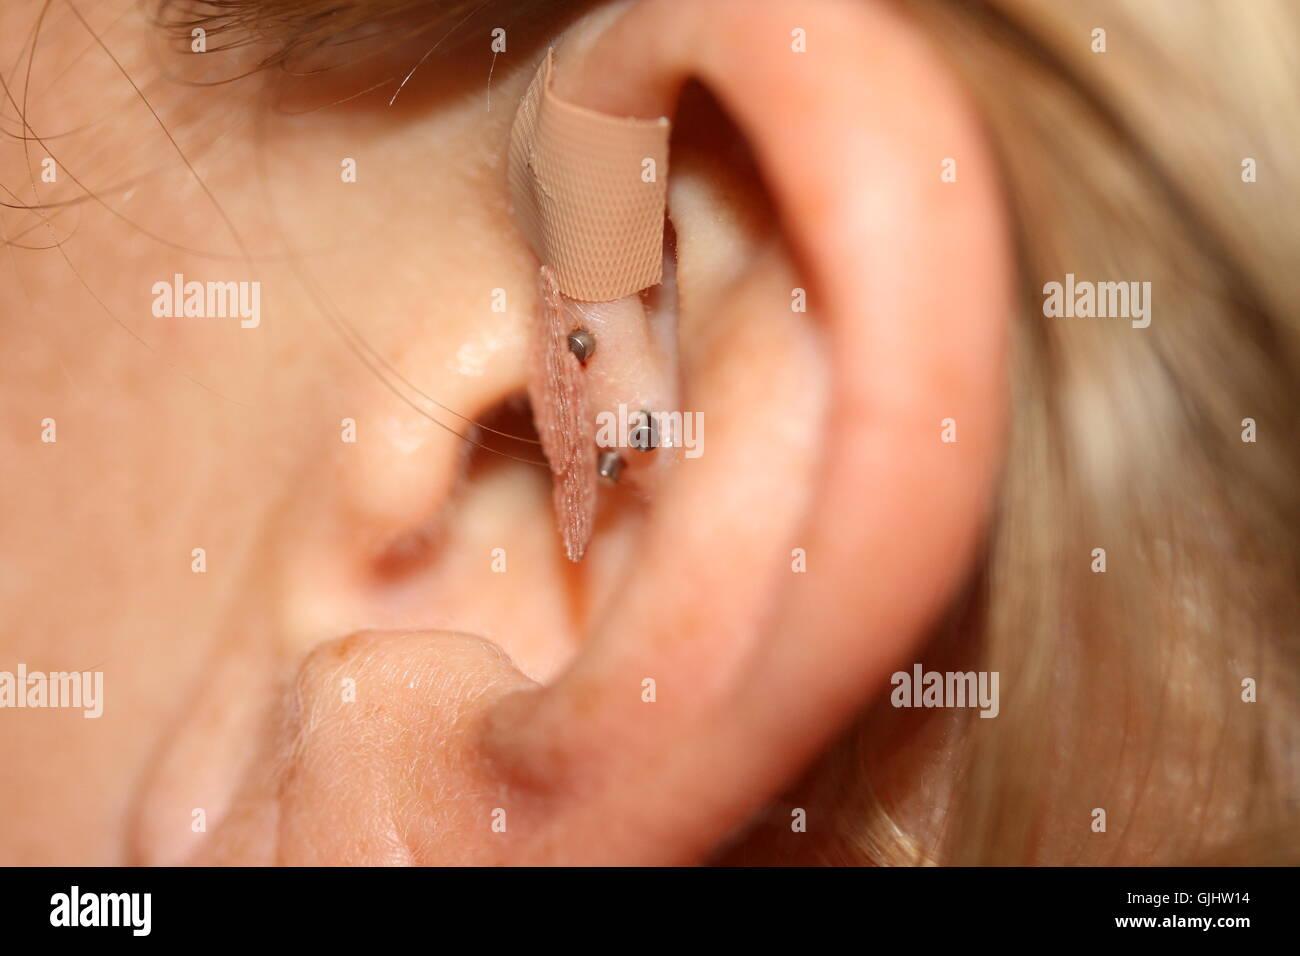 Ear Shell Stock Photos & Ear Shell Stock Images - Alamy